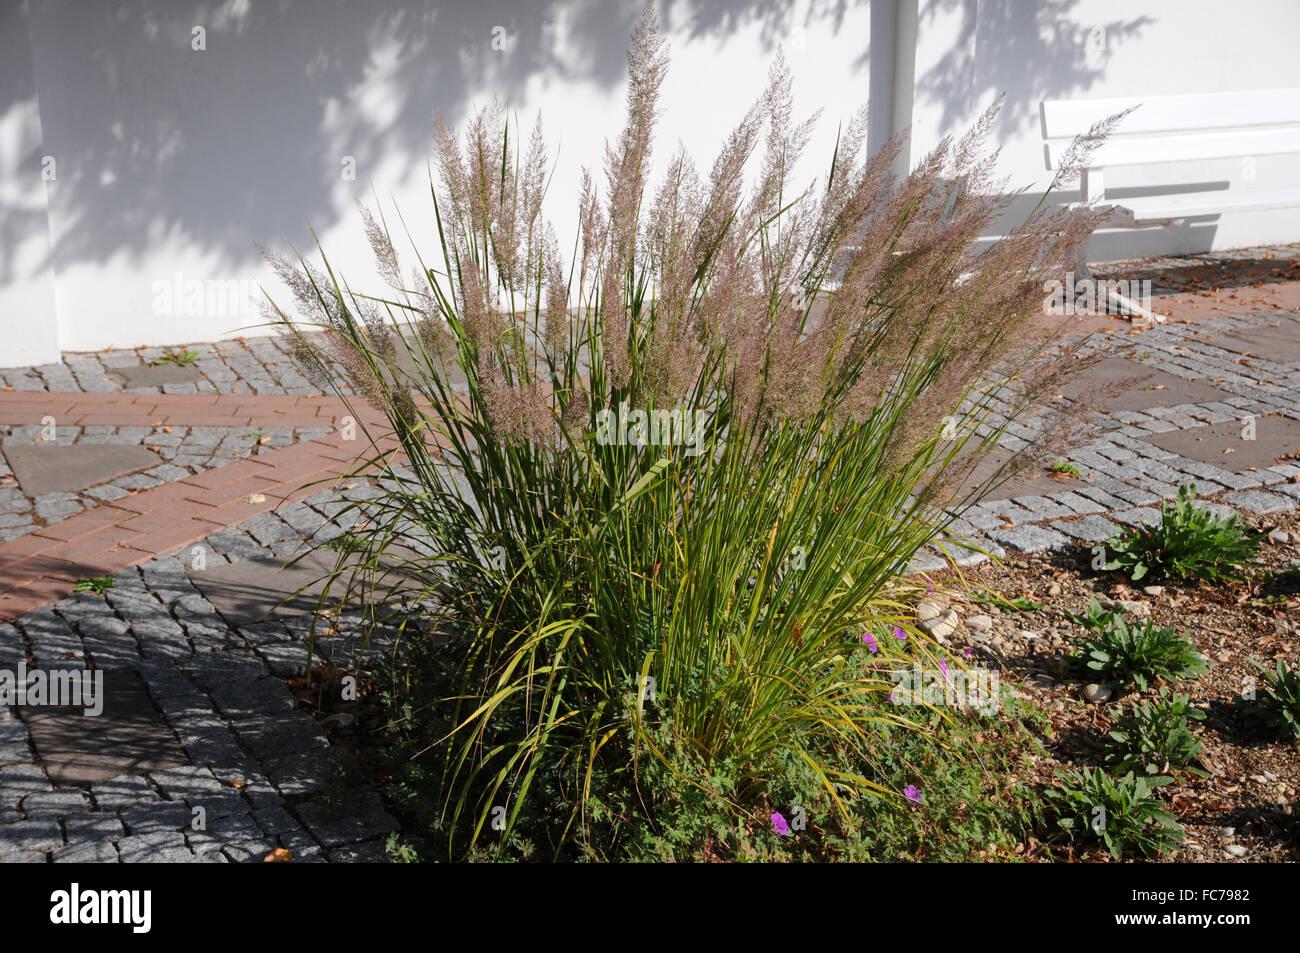 Calamagrostis Brachytricha Stock Photos & Calamagrostis ...